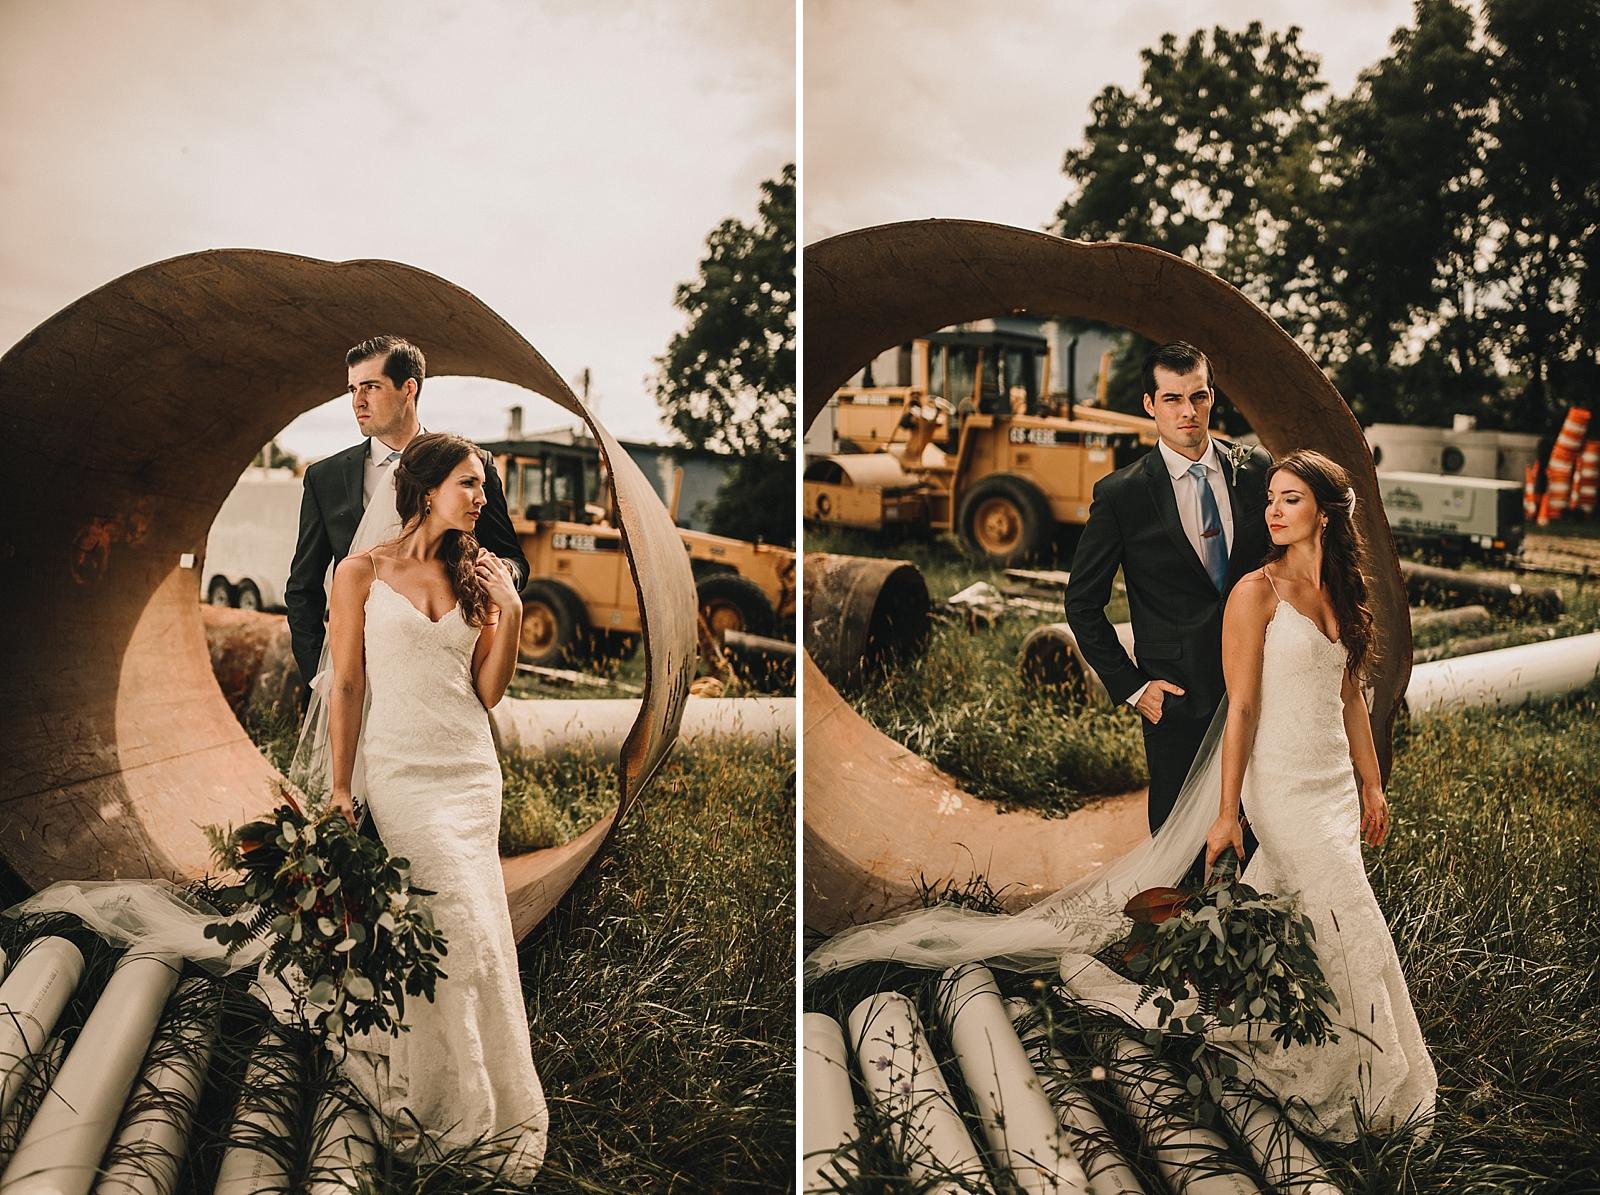 Brielle&Rob-TanaHelenePhotography-170_WEB.jpg